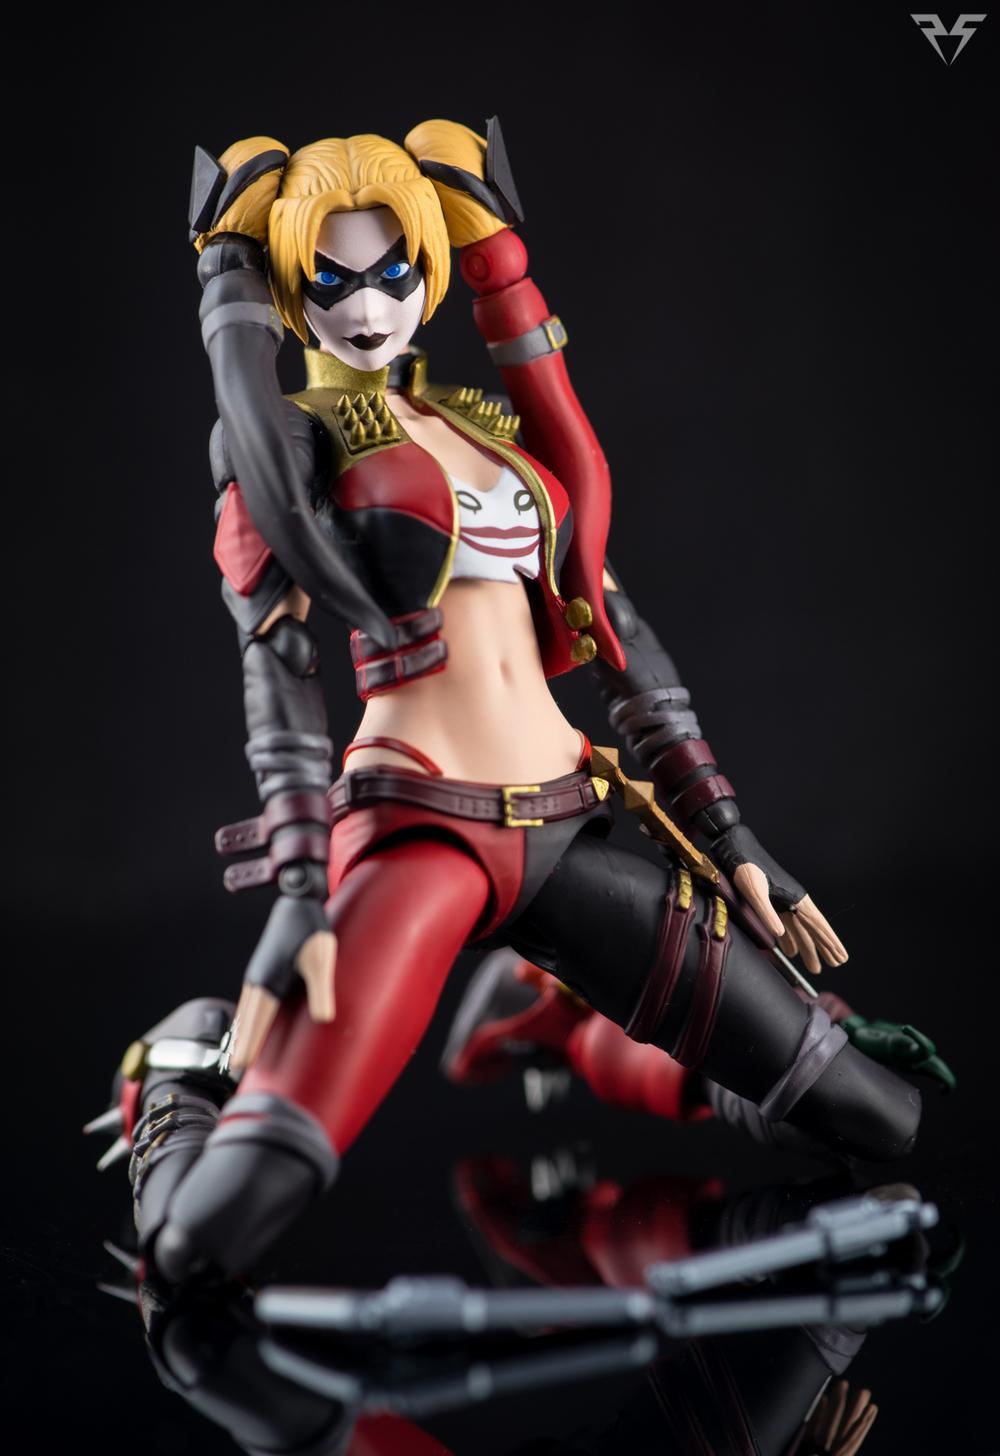 Figuarts Harley Quinn-8.jpg